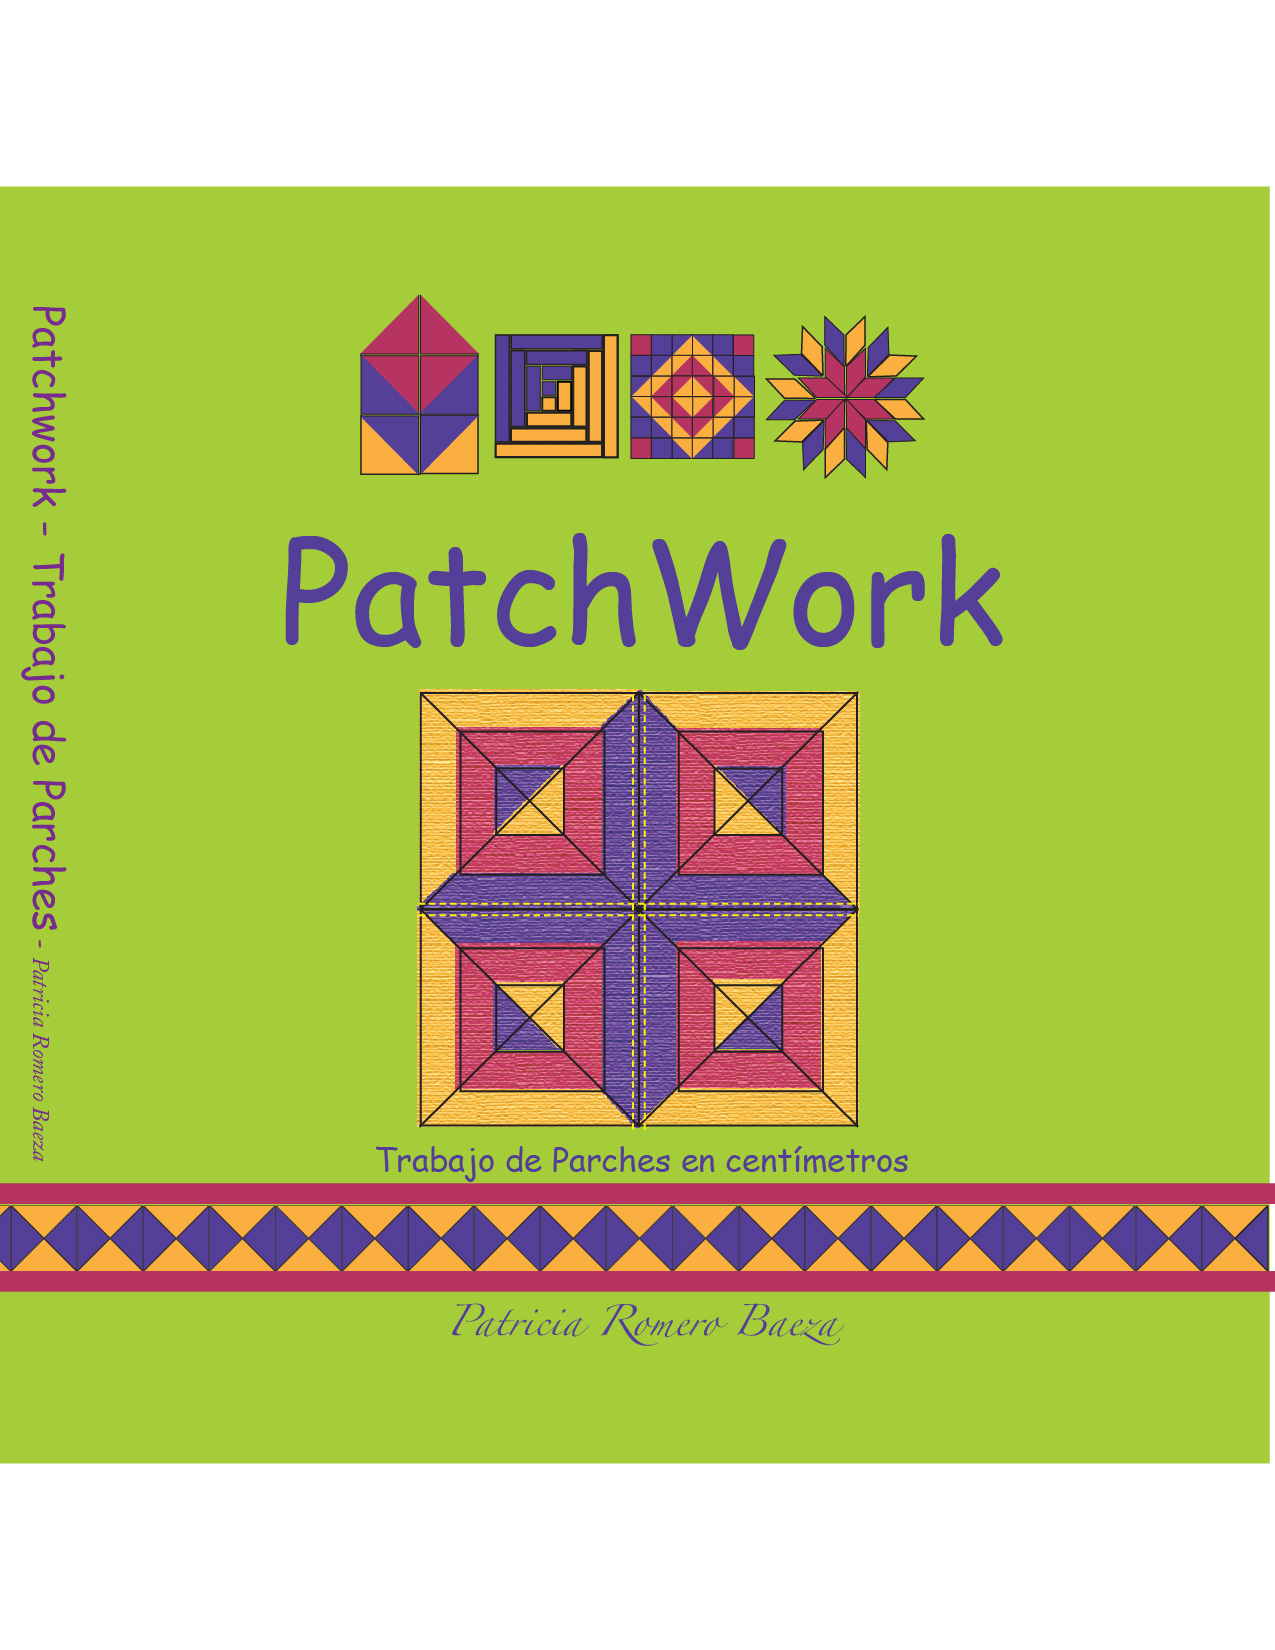 LIBRO: Patchwork IMPRESO